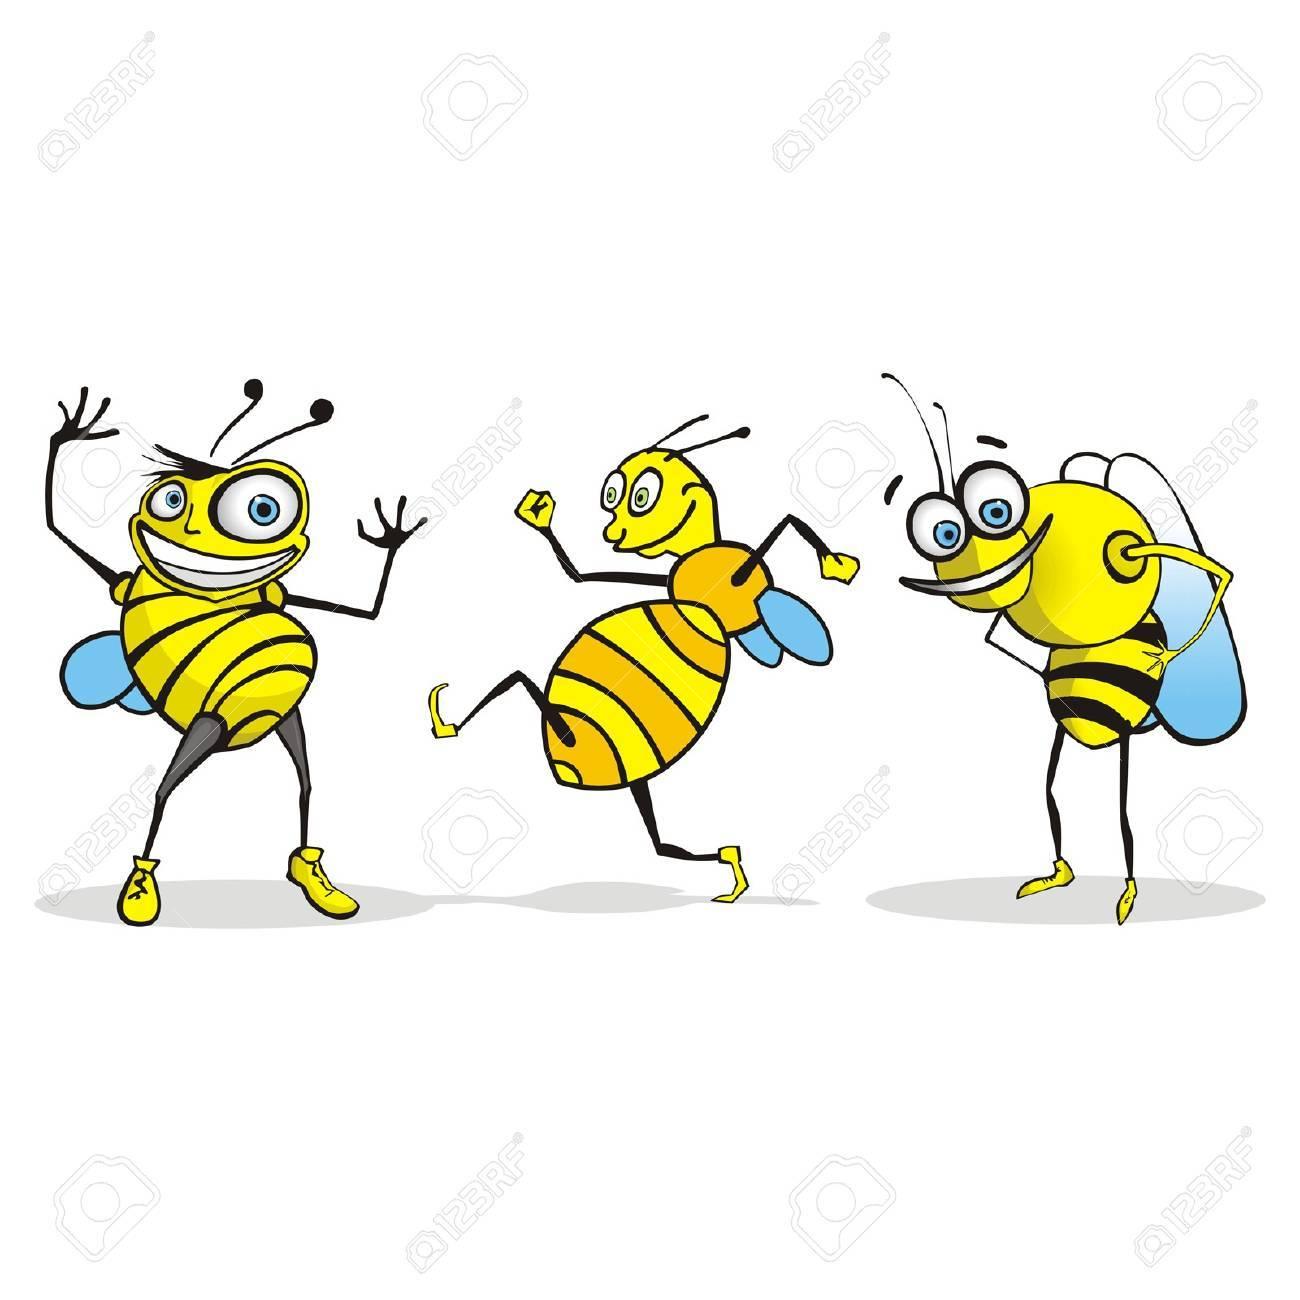 Bee Cartoon Character Stock Vector - 11945558